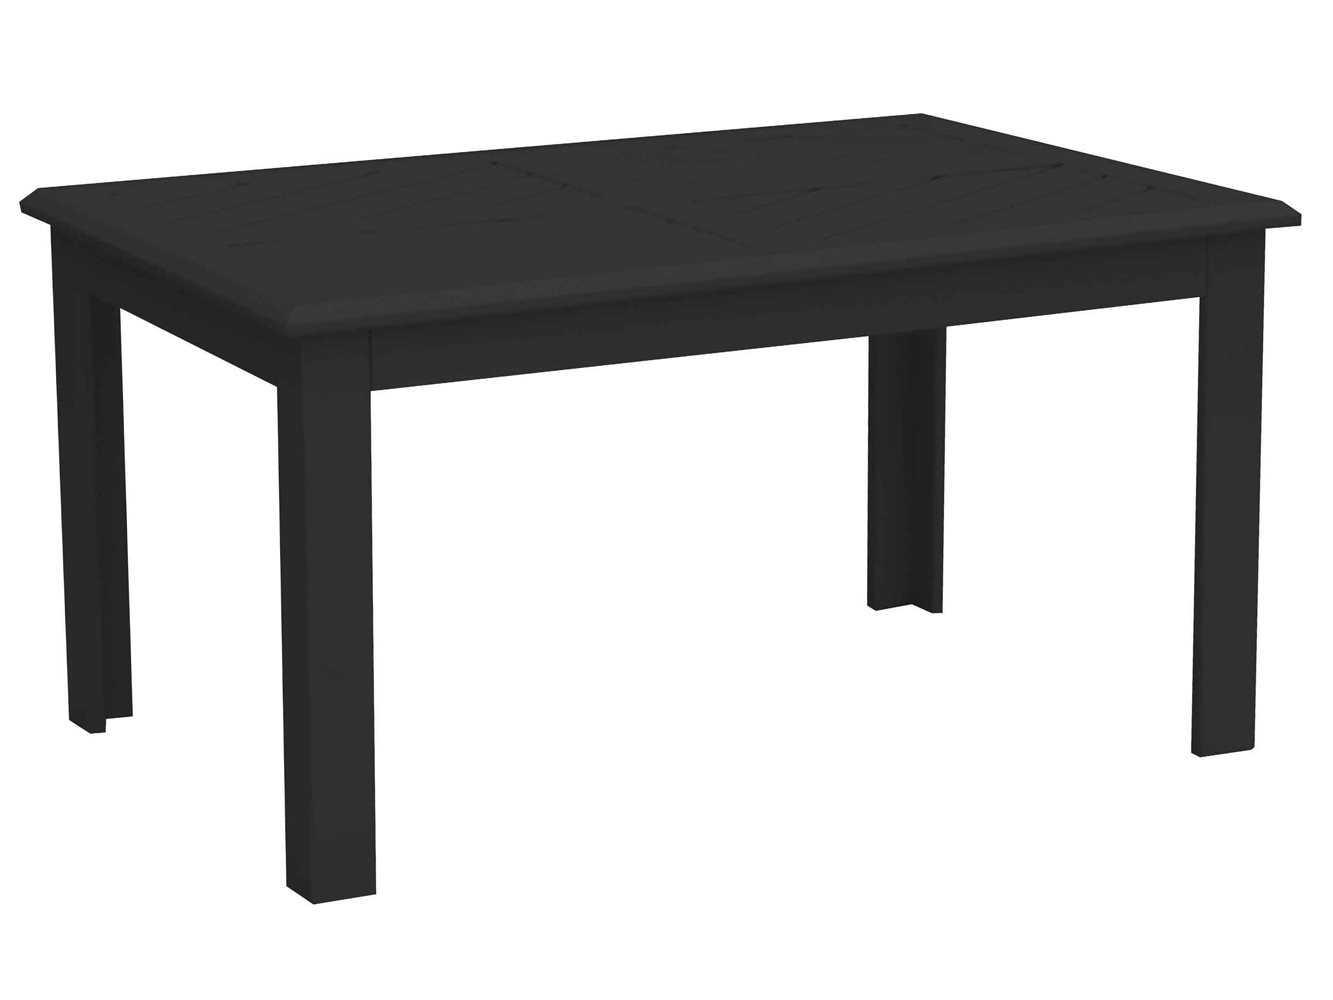 Paragon casual talia aluminum 36 x 24 rectangular coffee for 24 x 24 coffee table